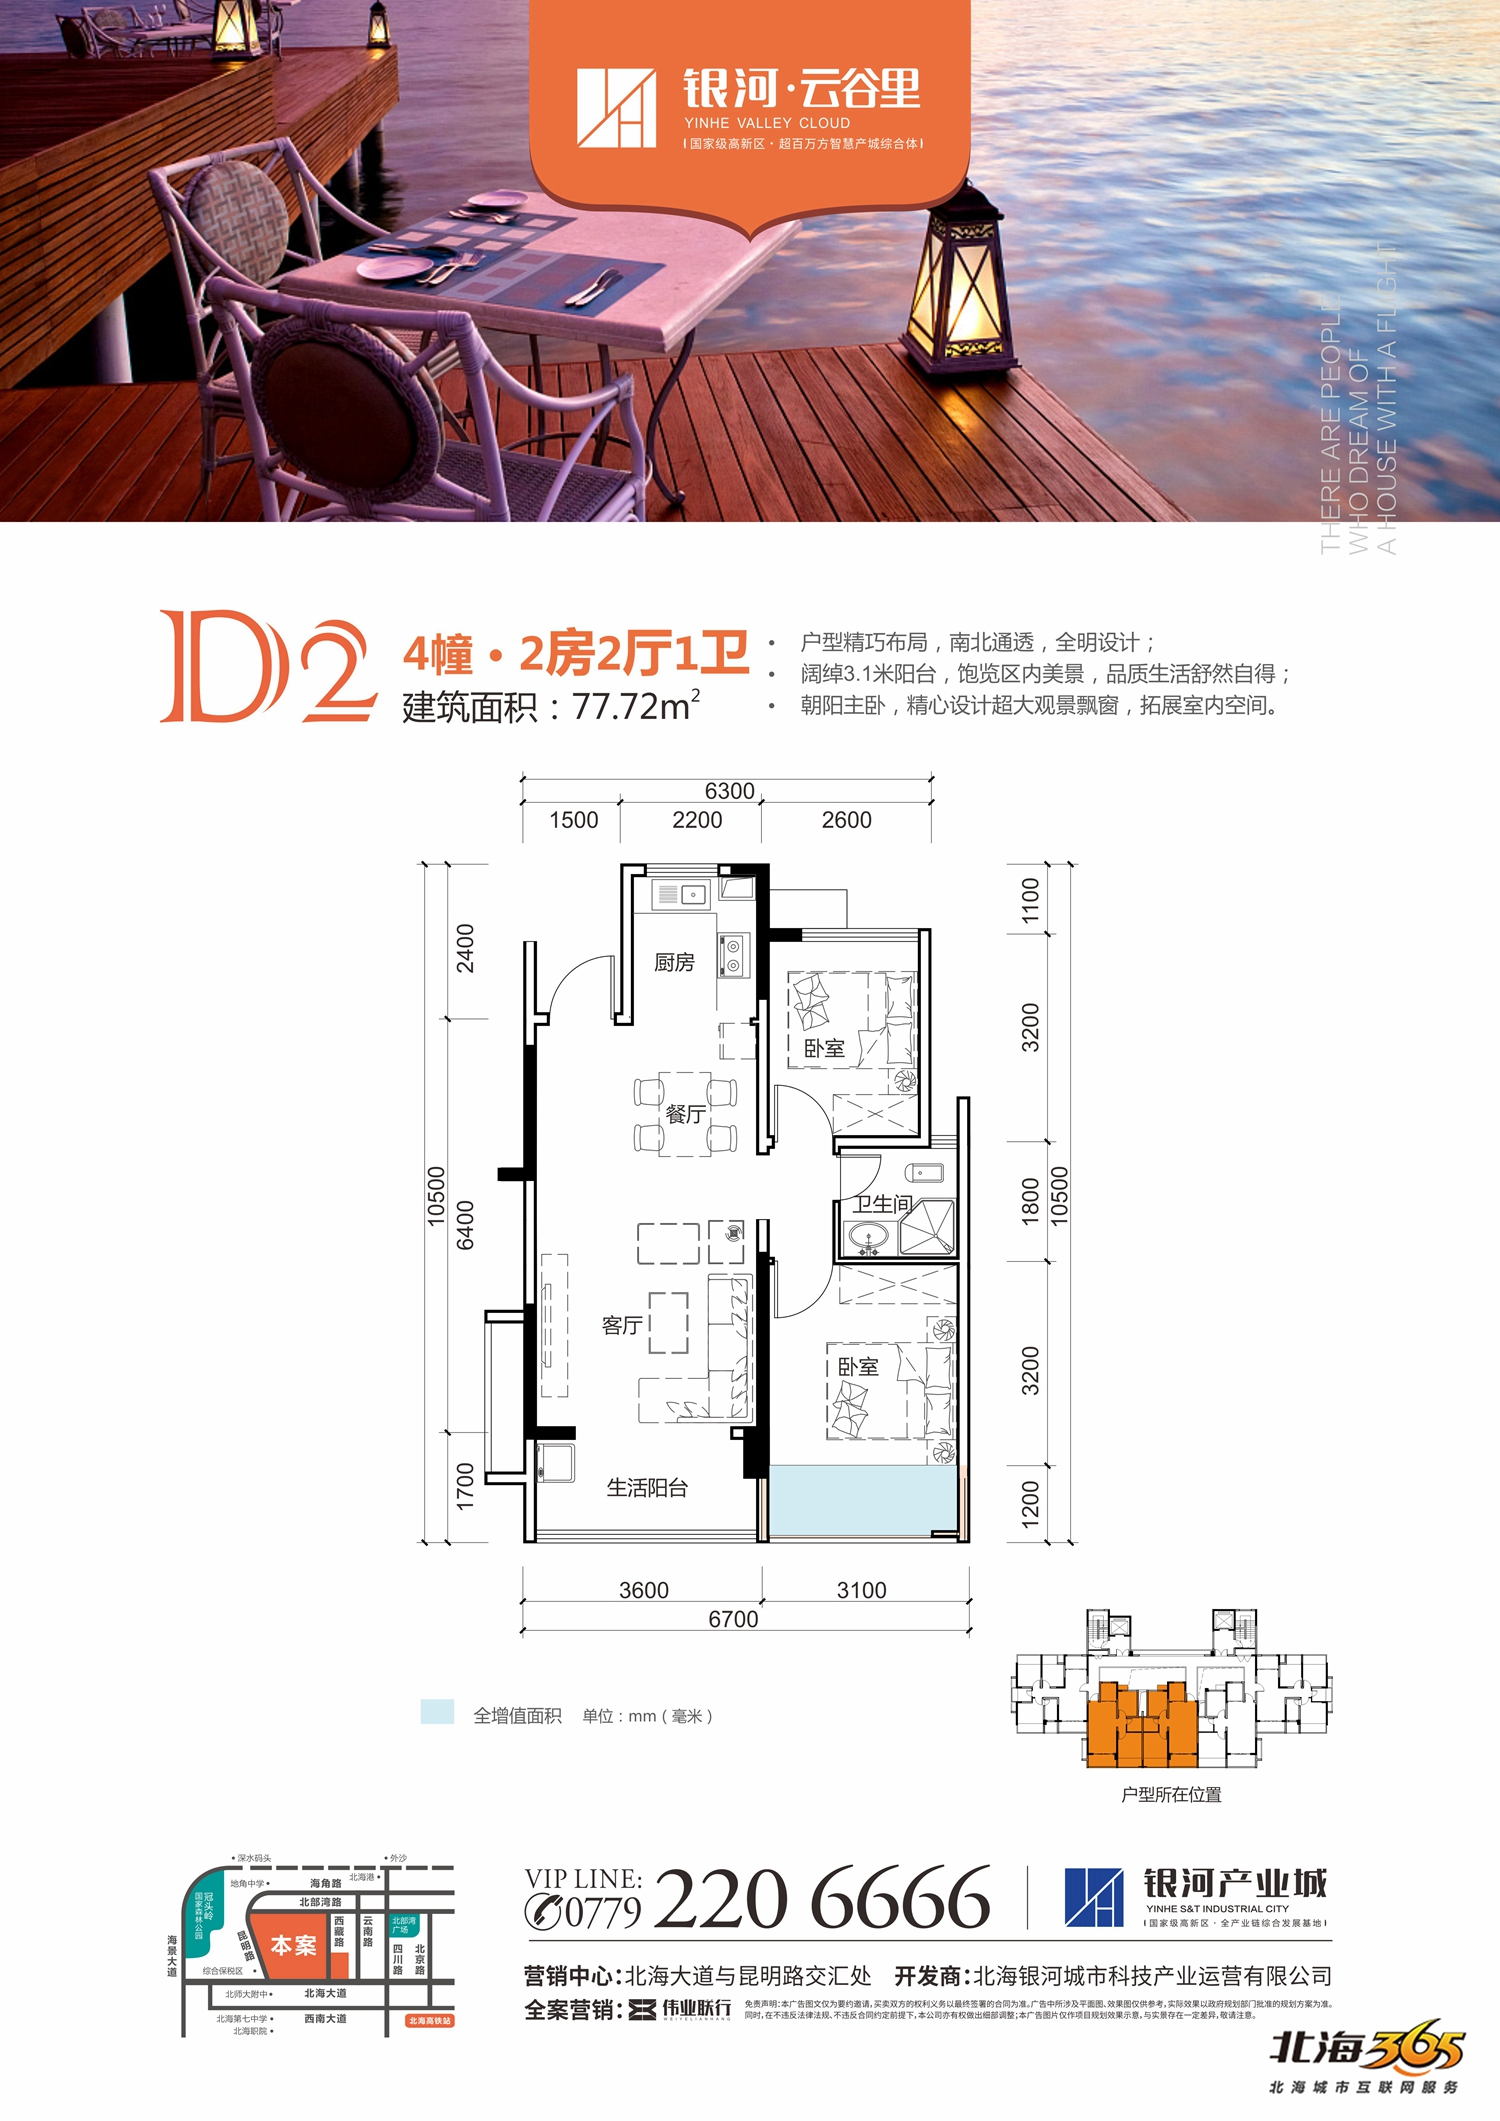 D2-4幢-2房2厅1卫